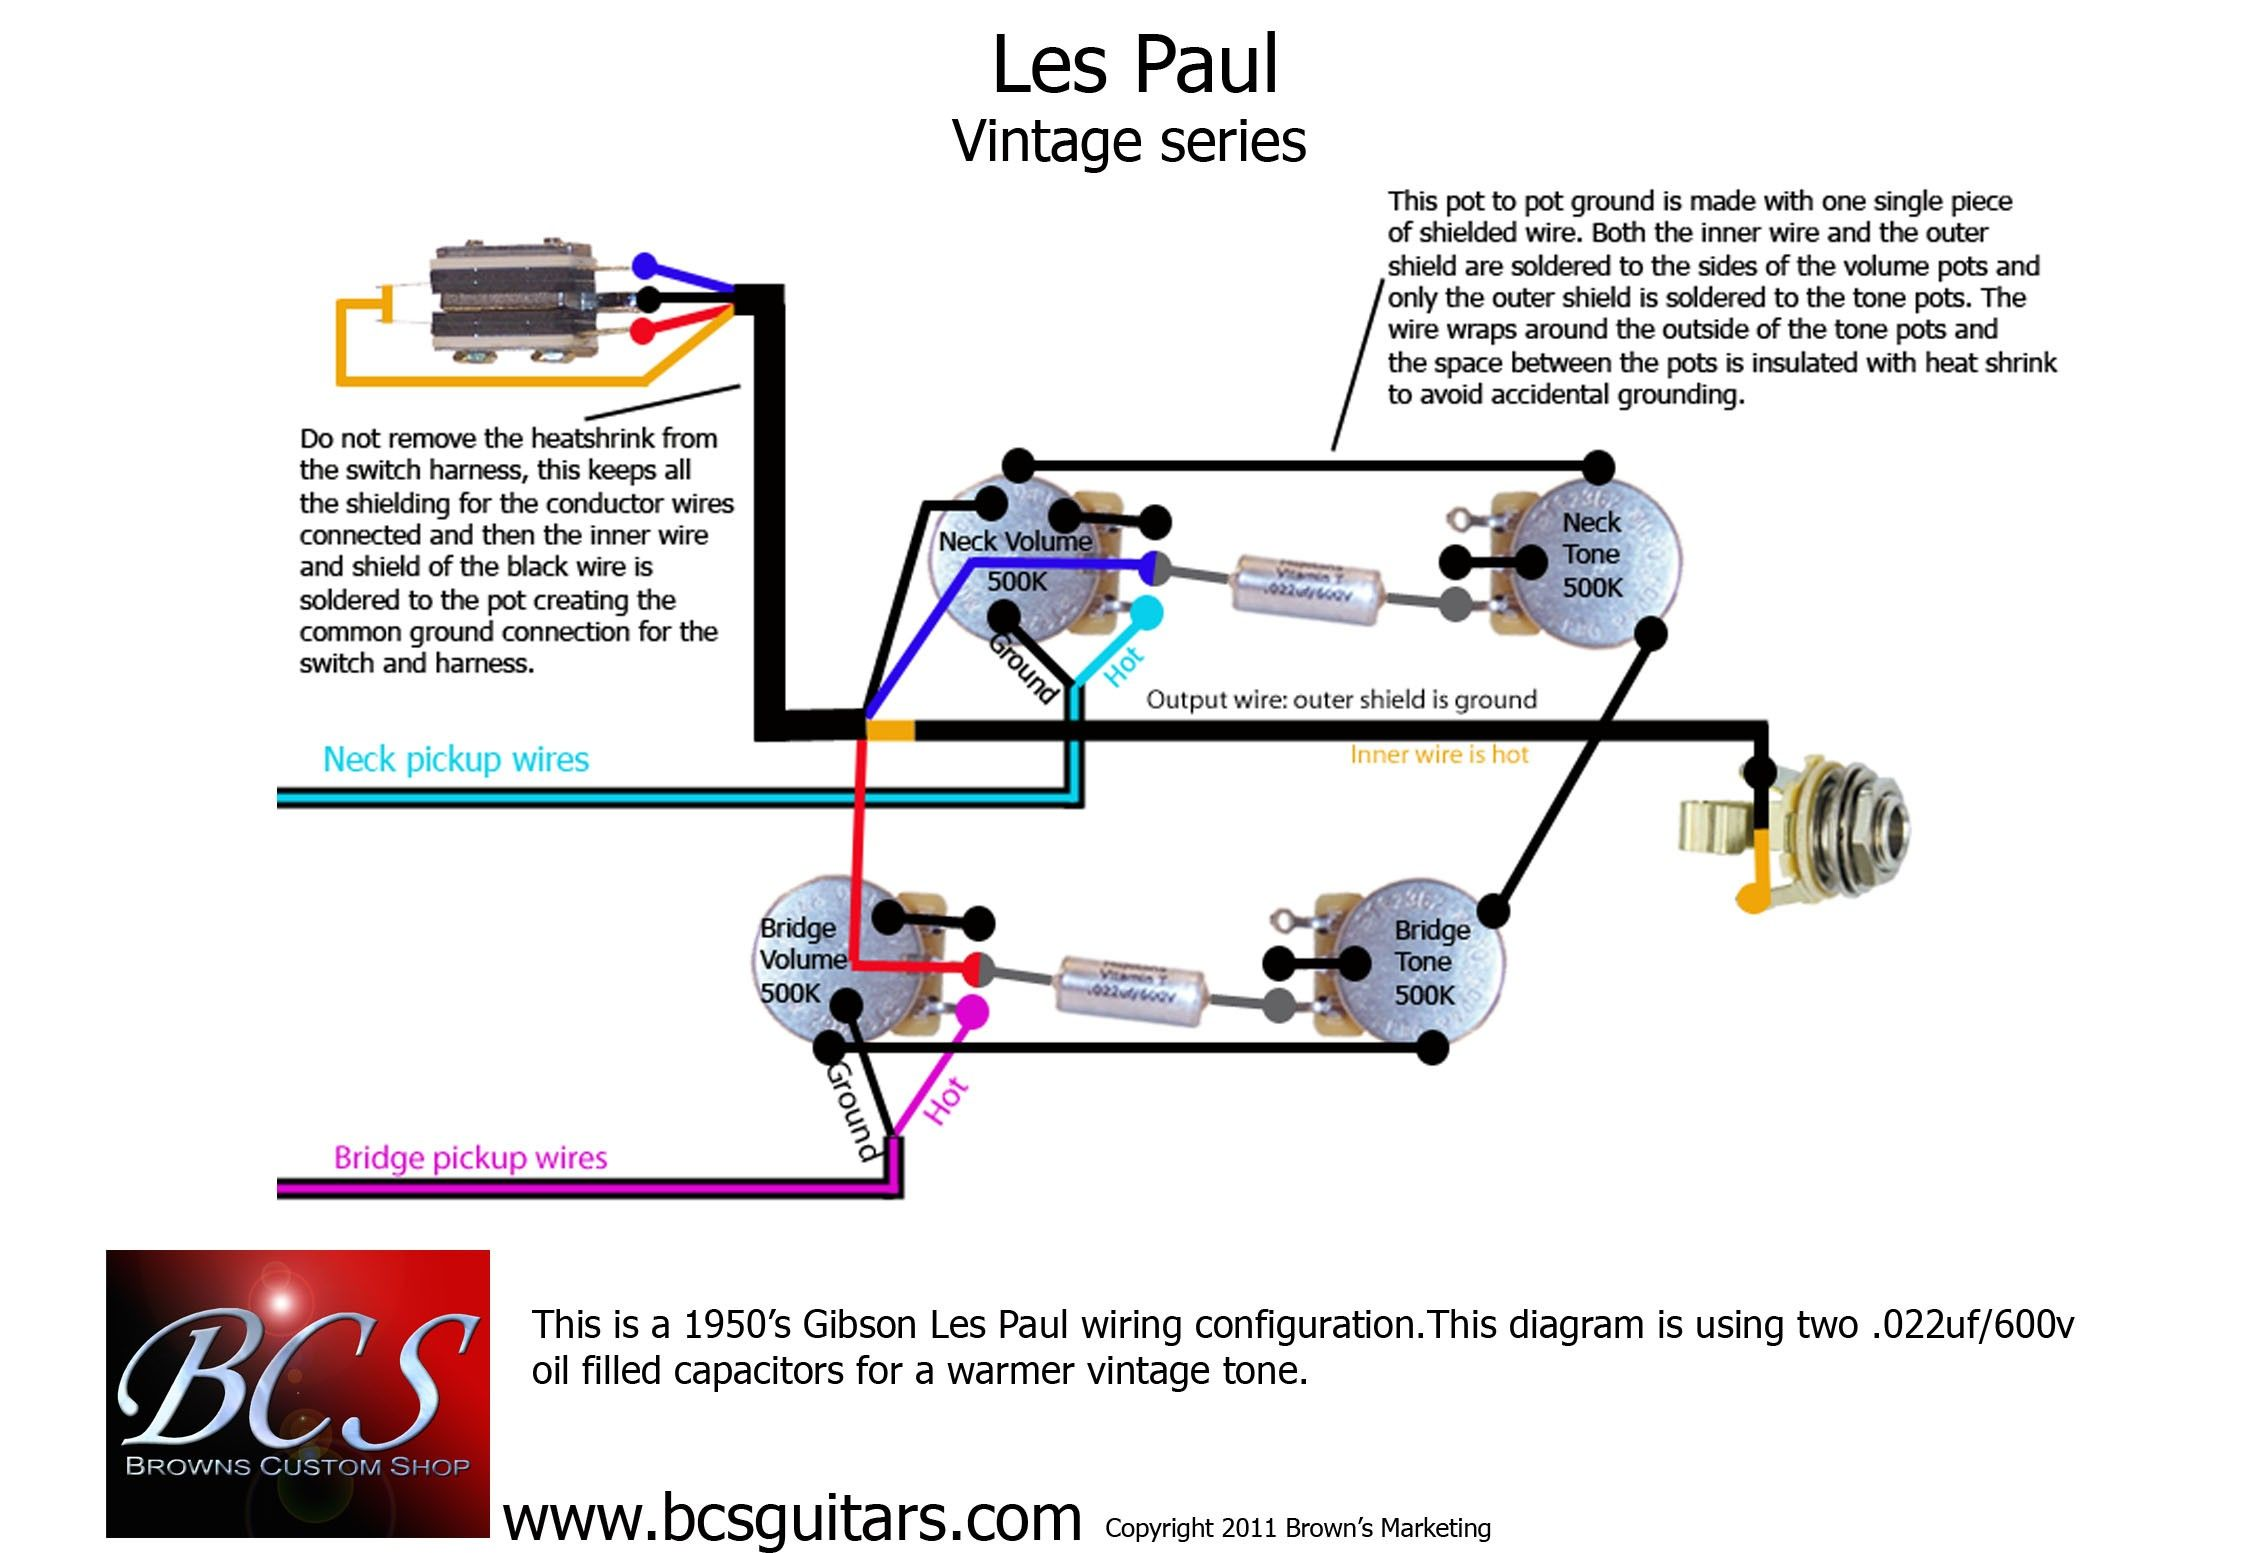 Diagram Diagramsample Diagramtemplate Wiringdiagram Diagramchart Worksheet Worksheettemplate Check Les Paul Epiphone Les Paul Epiphone Les Paul Special